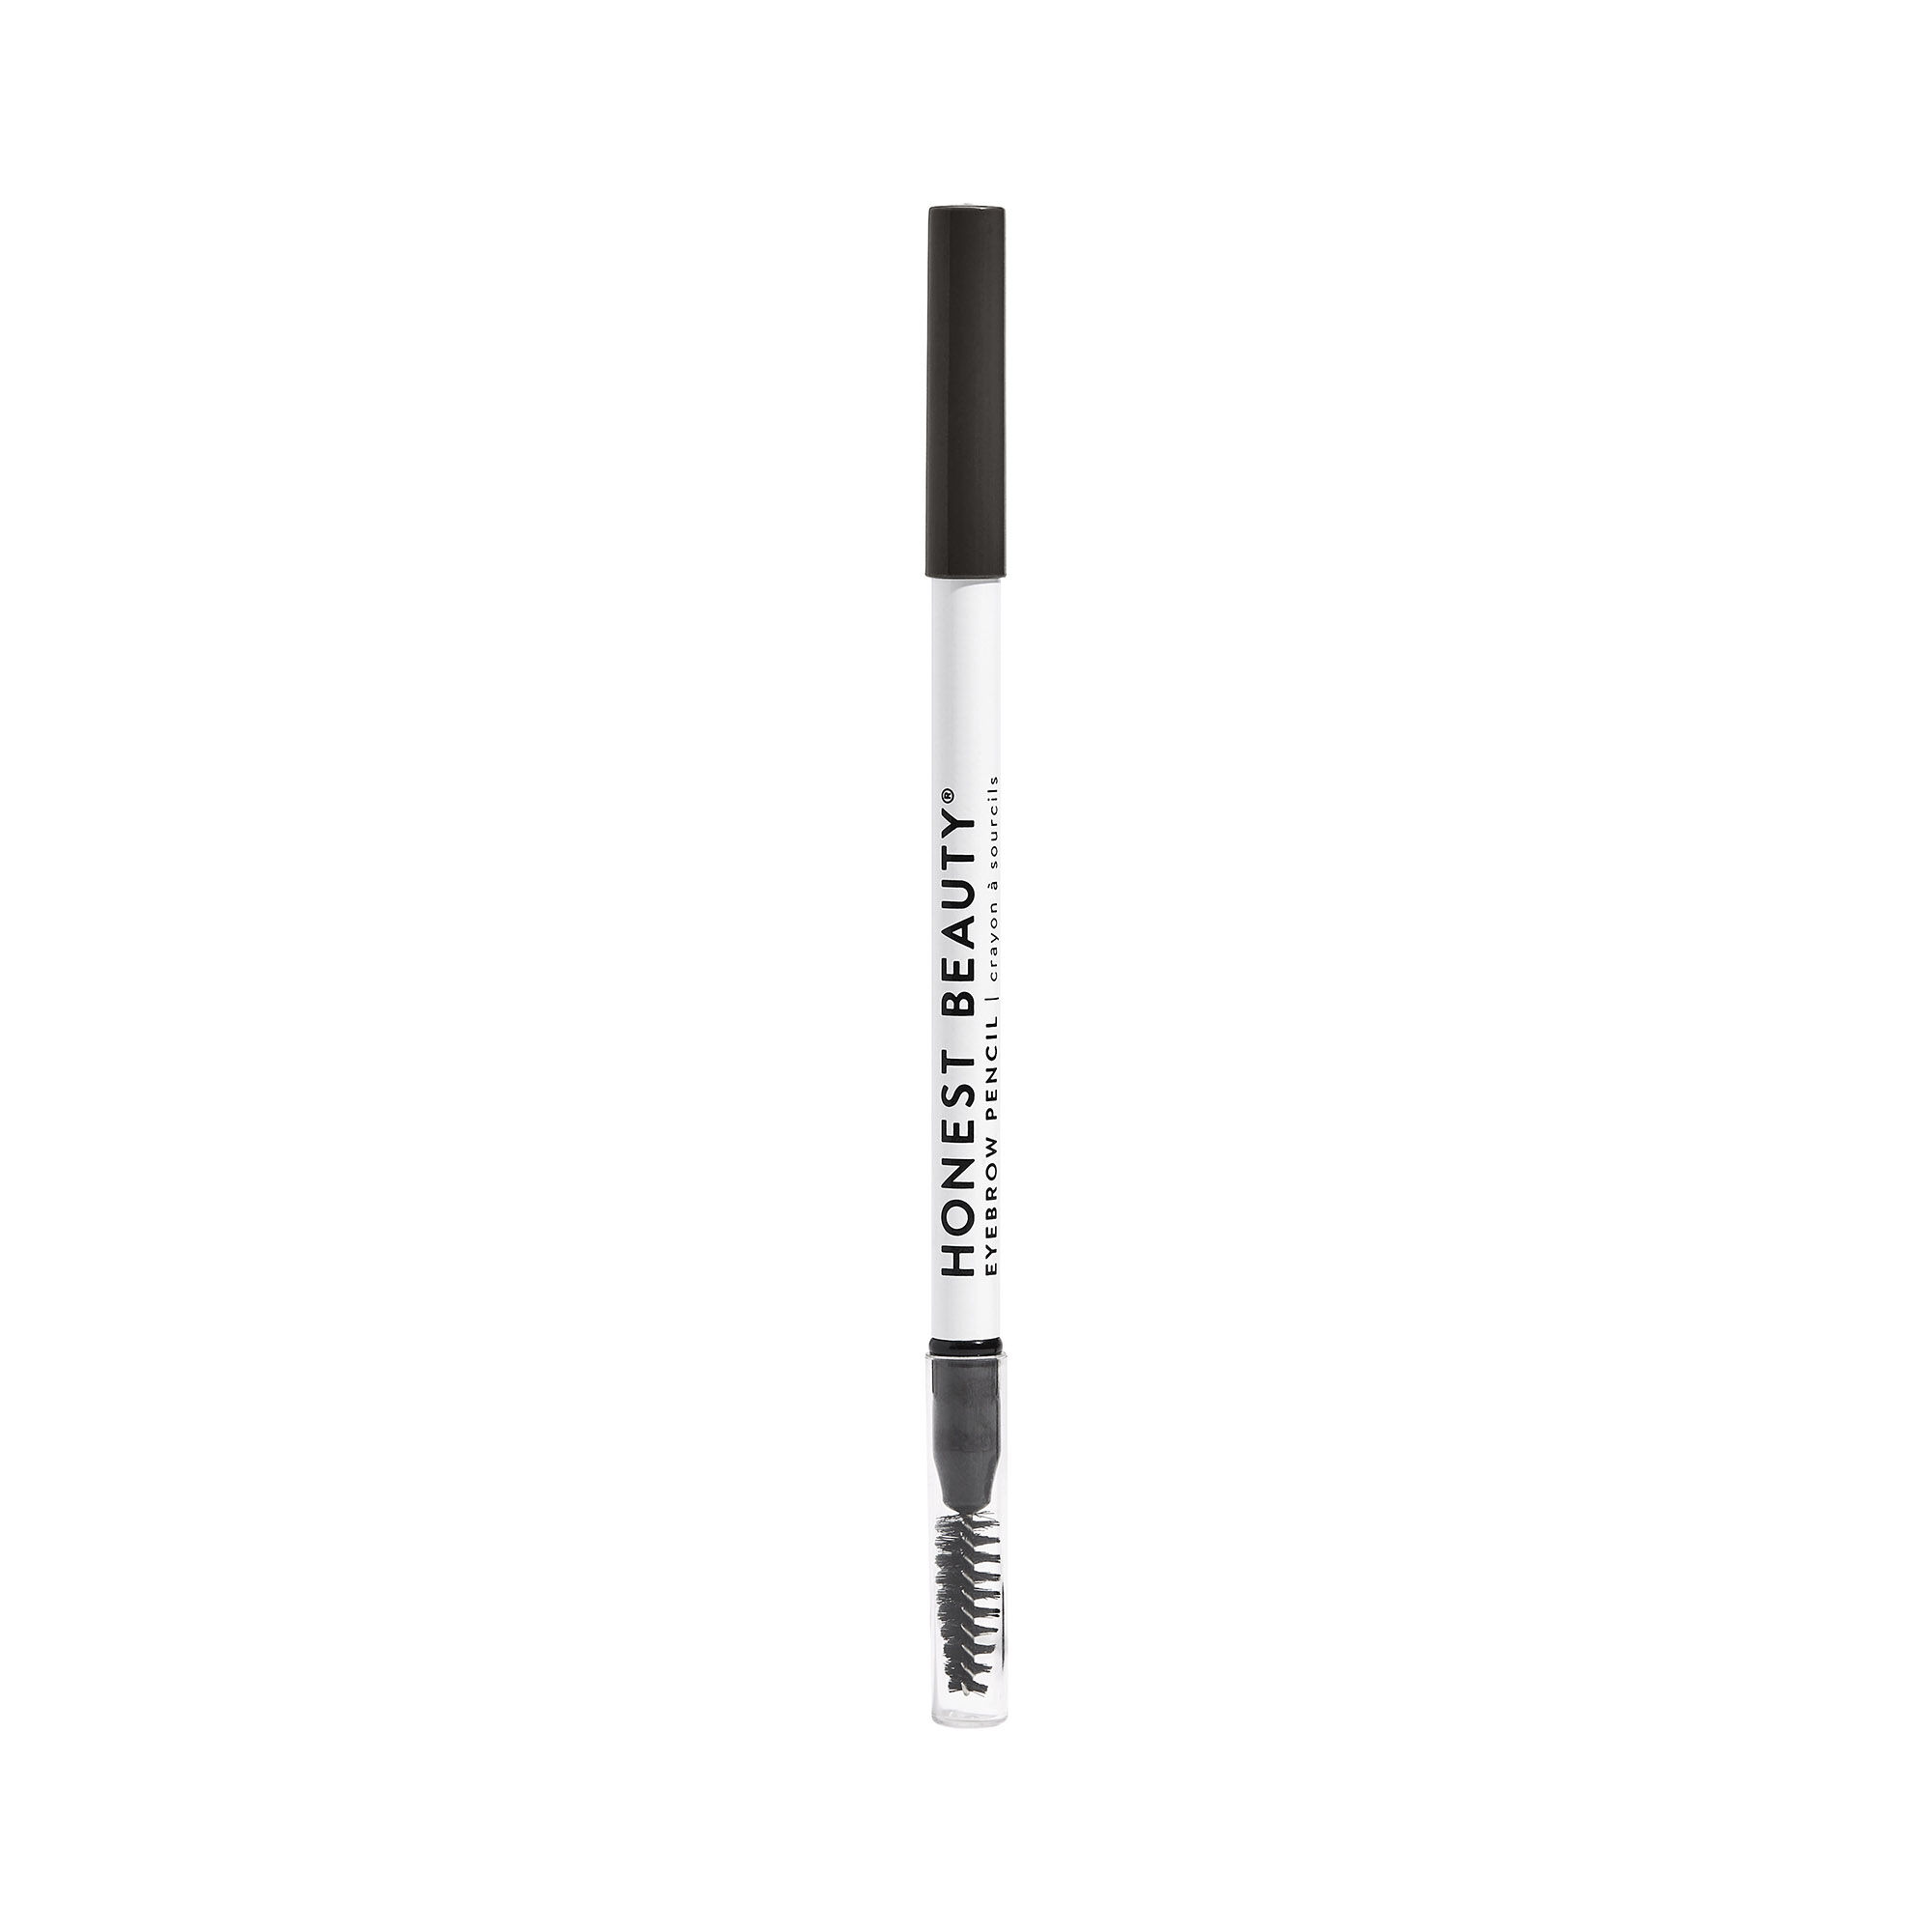 Eyebrow Pencil, Soft Black